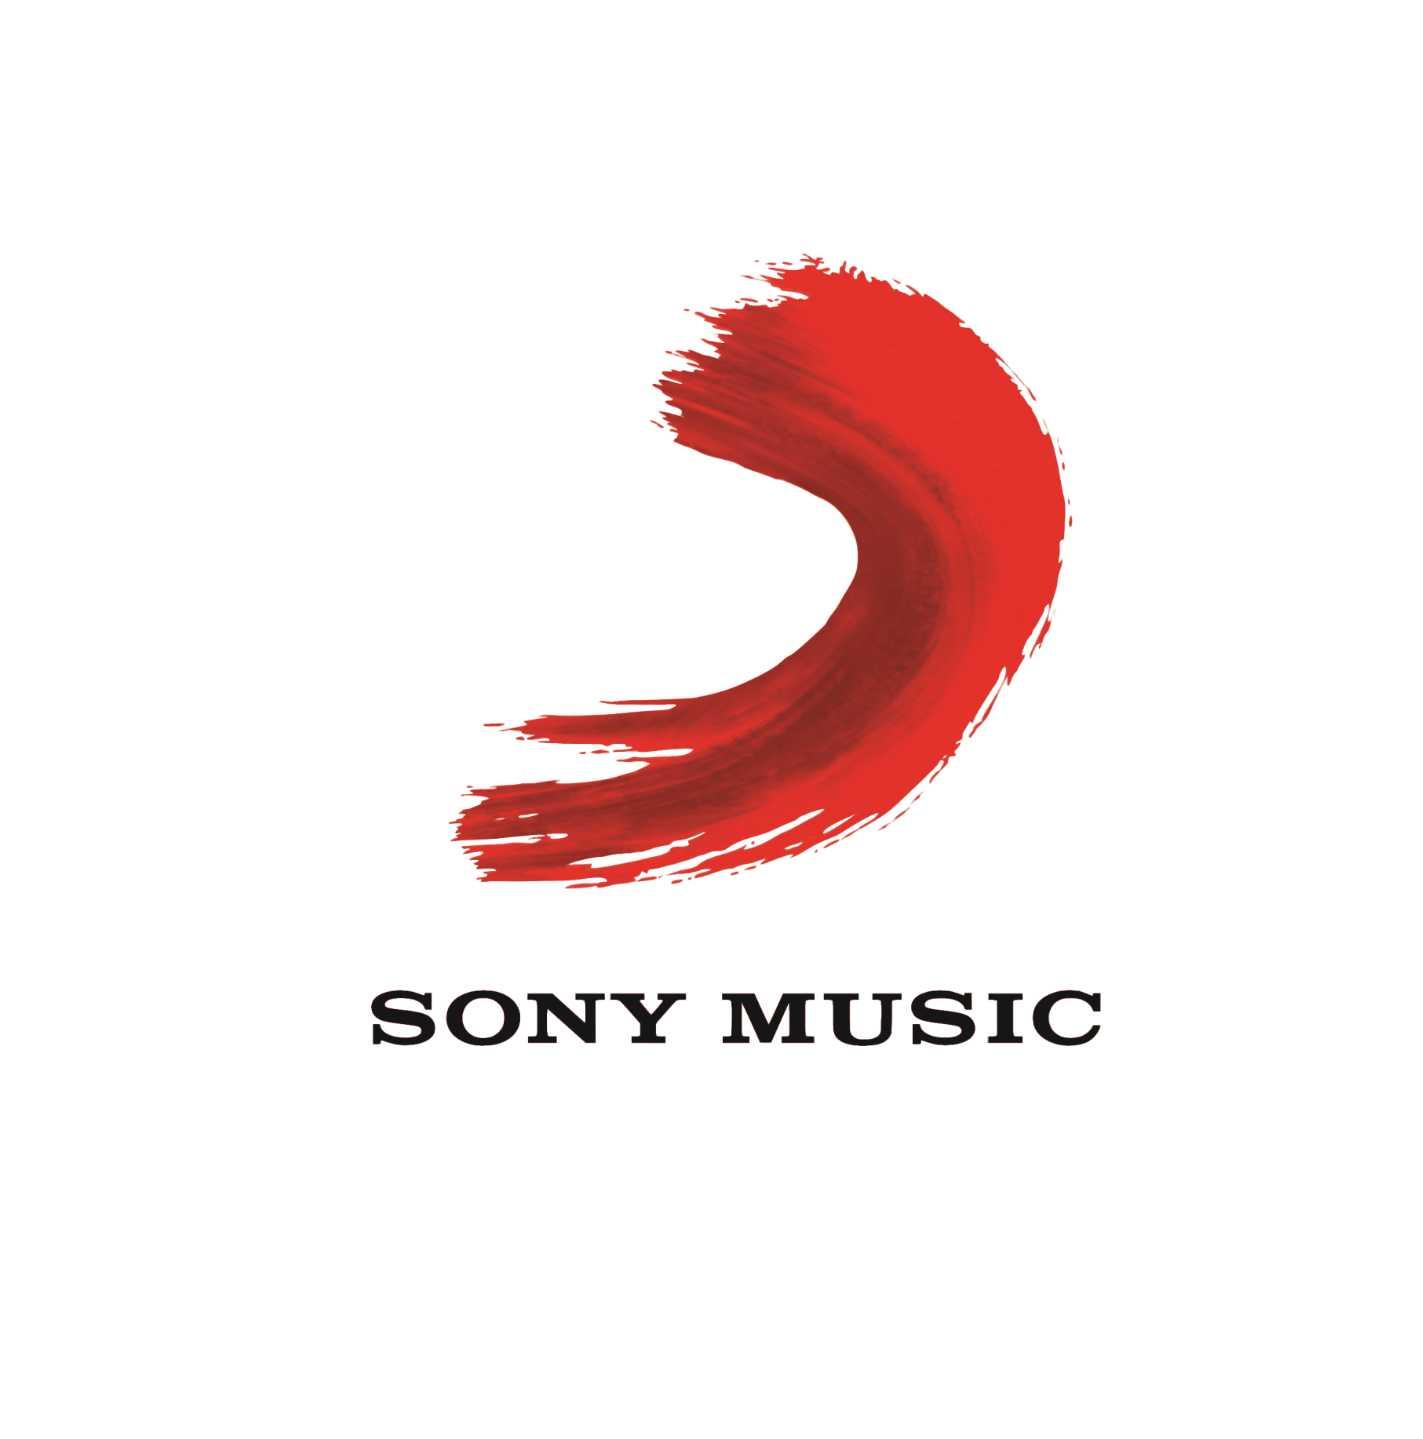 Sony good.jpg